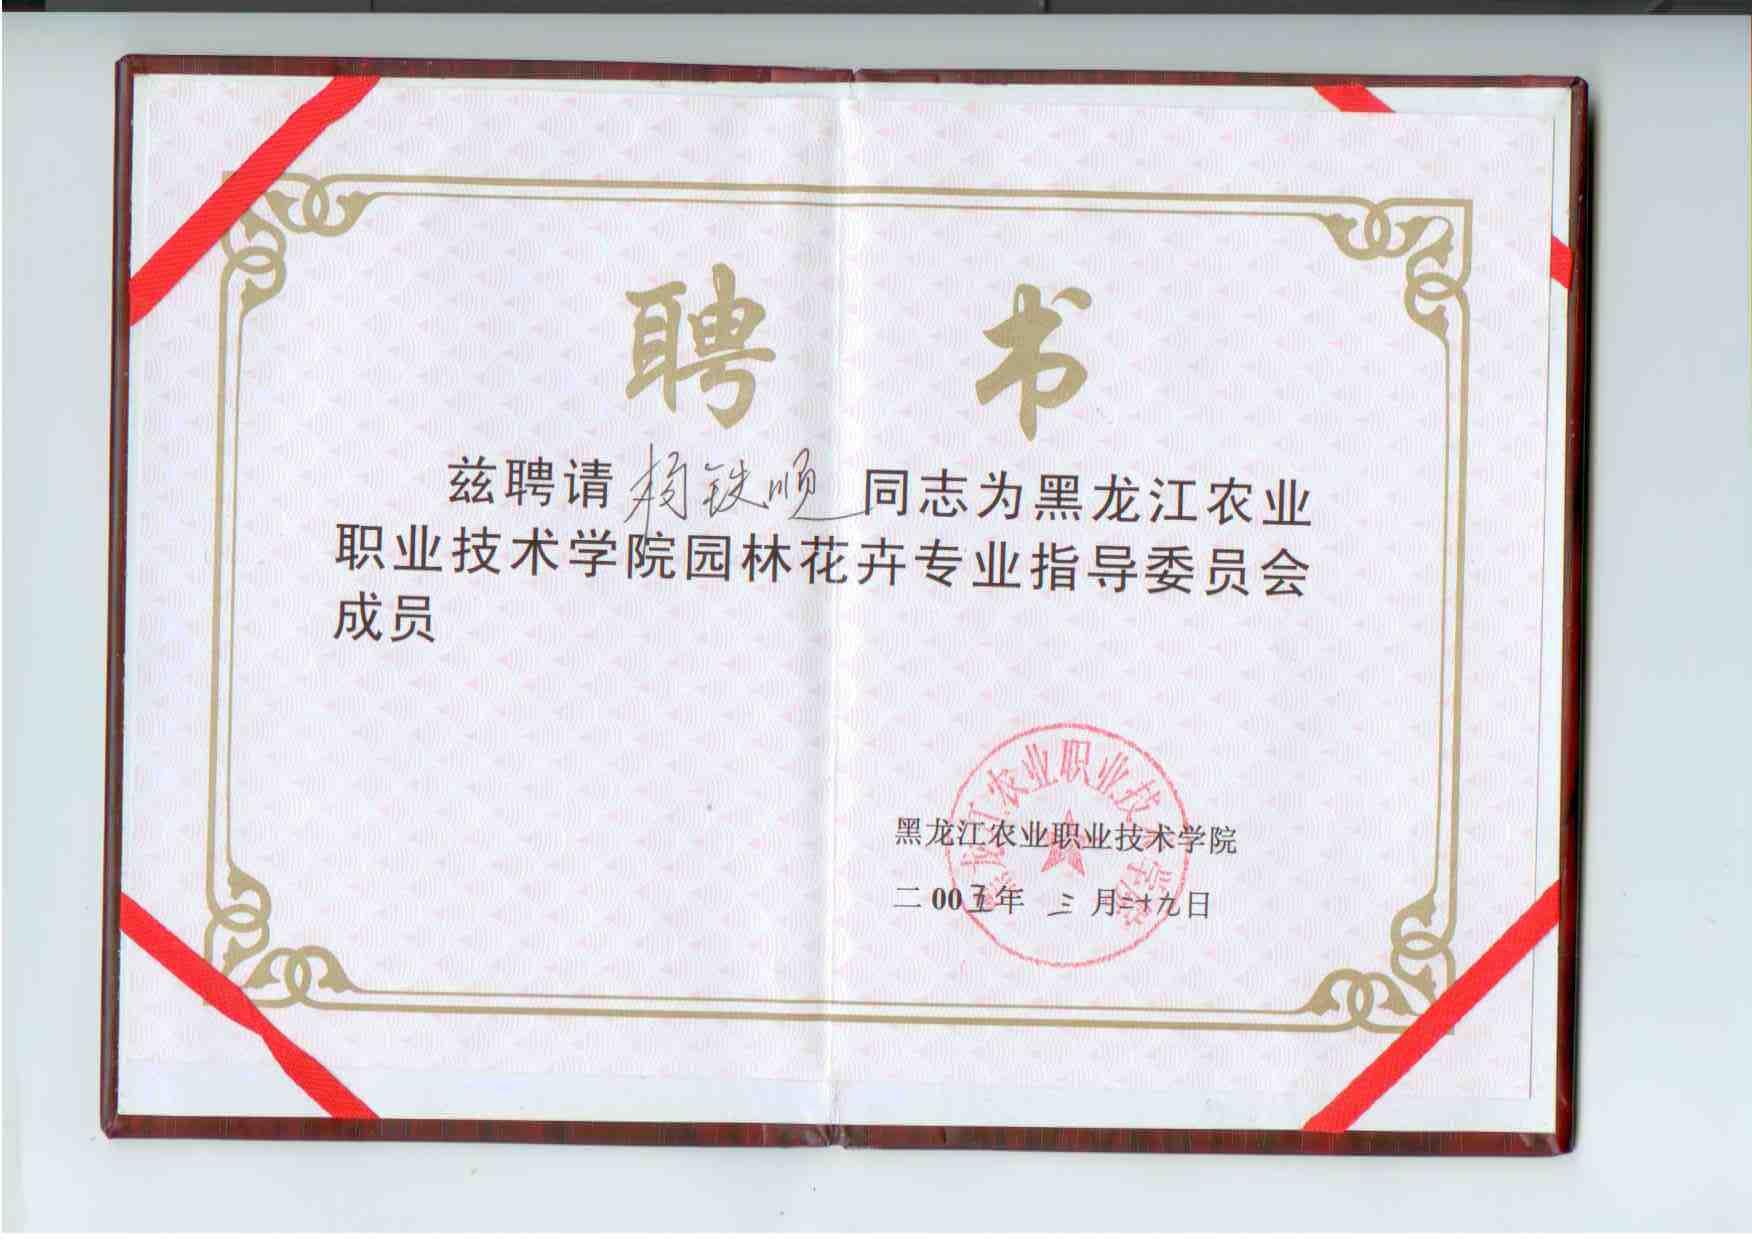 "<div style=""text-align:center;""> 黑龙江农业职业技术学院<br /> 园林花卉专业指导委员会成员 </div>"